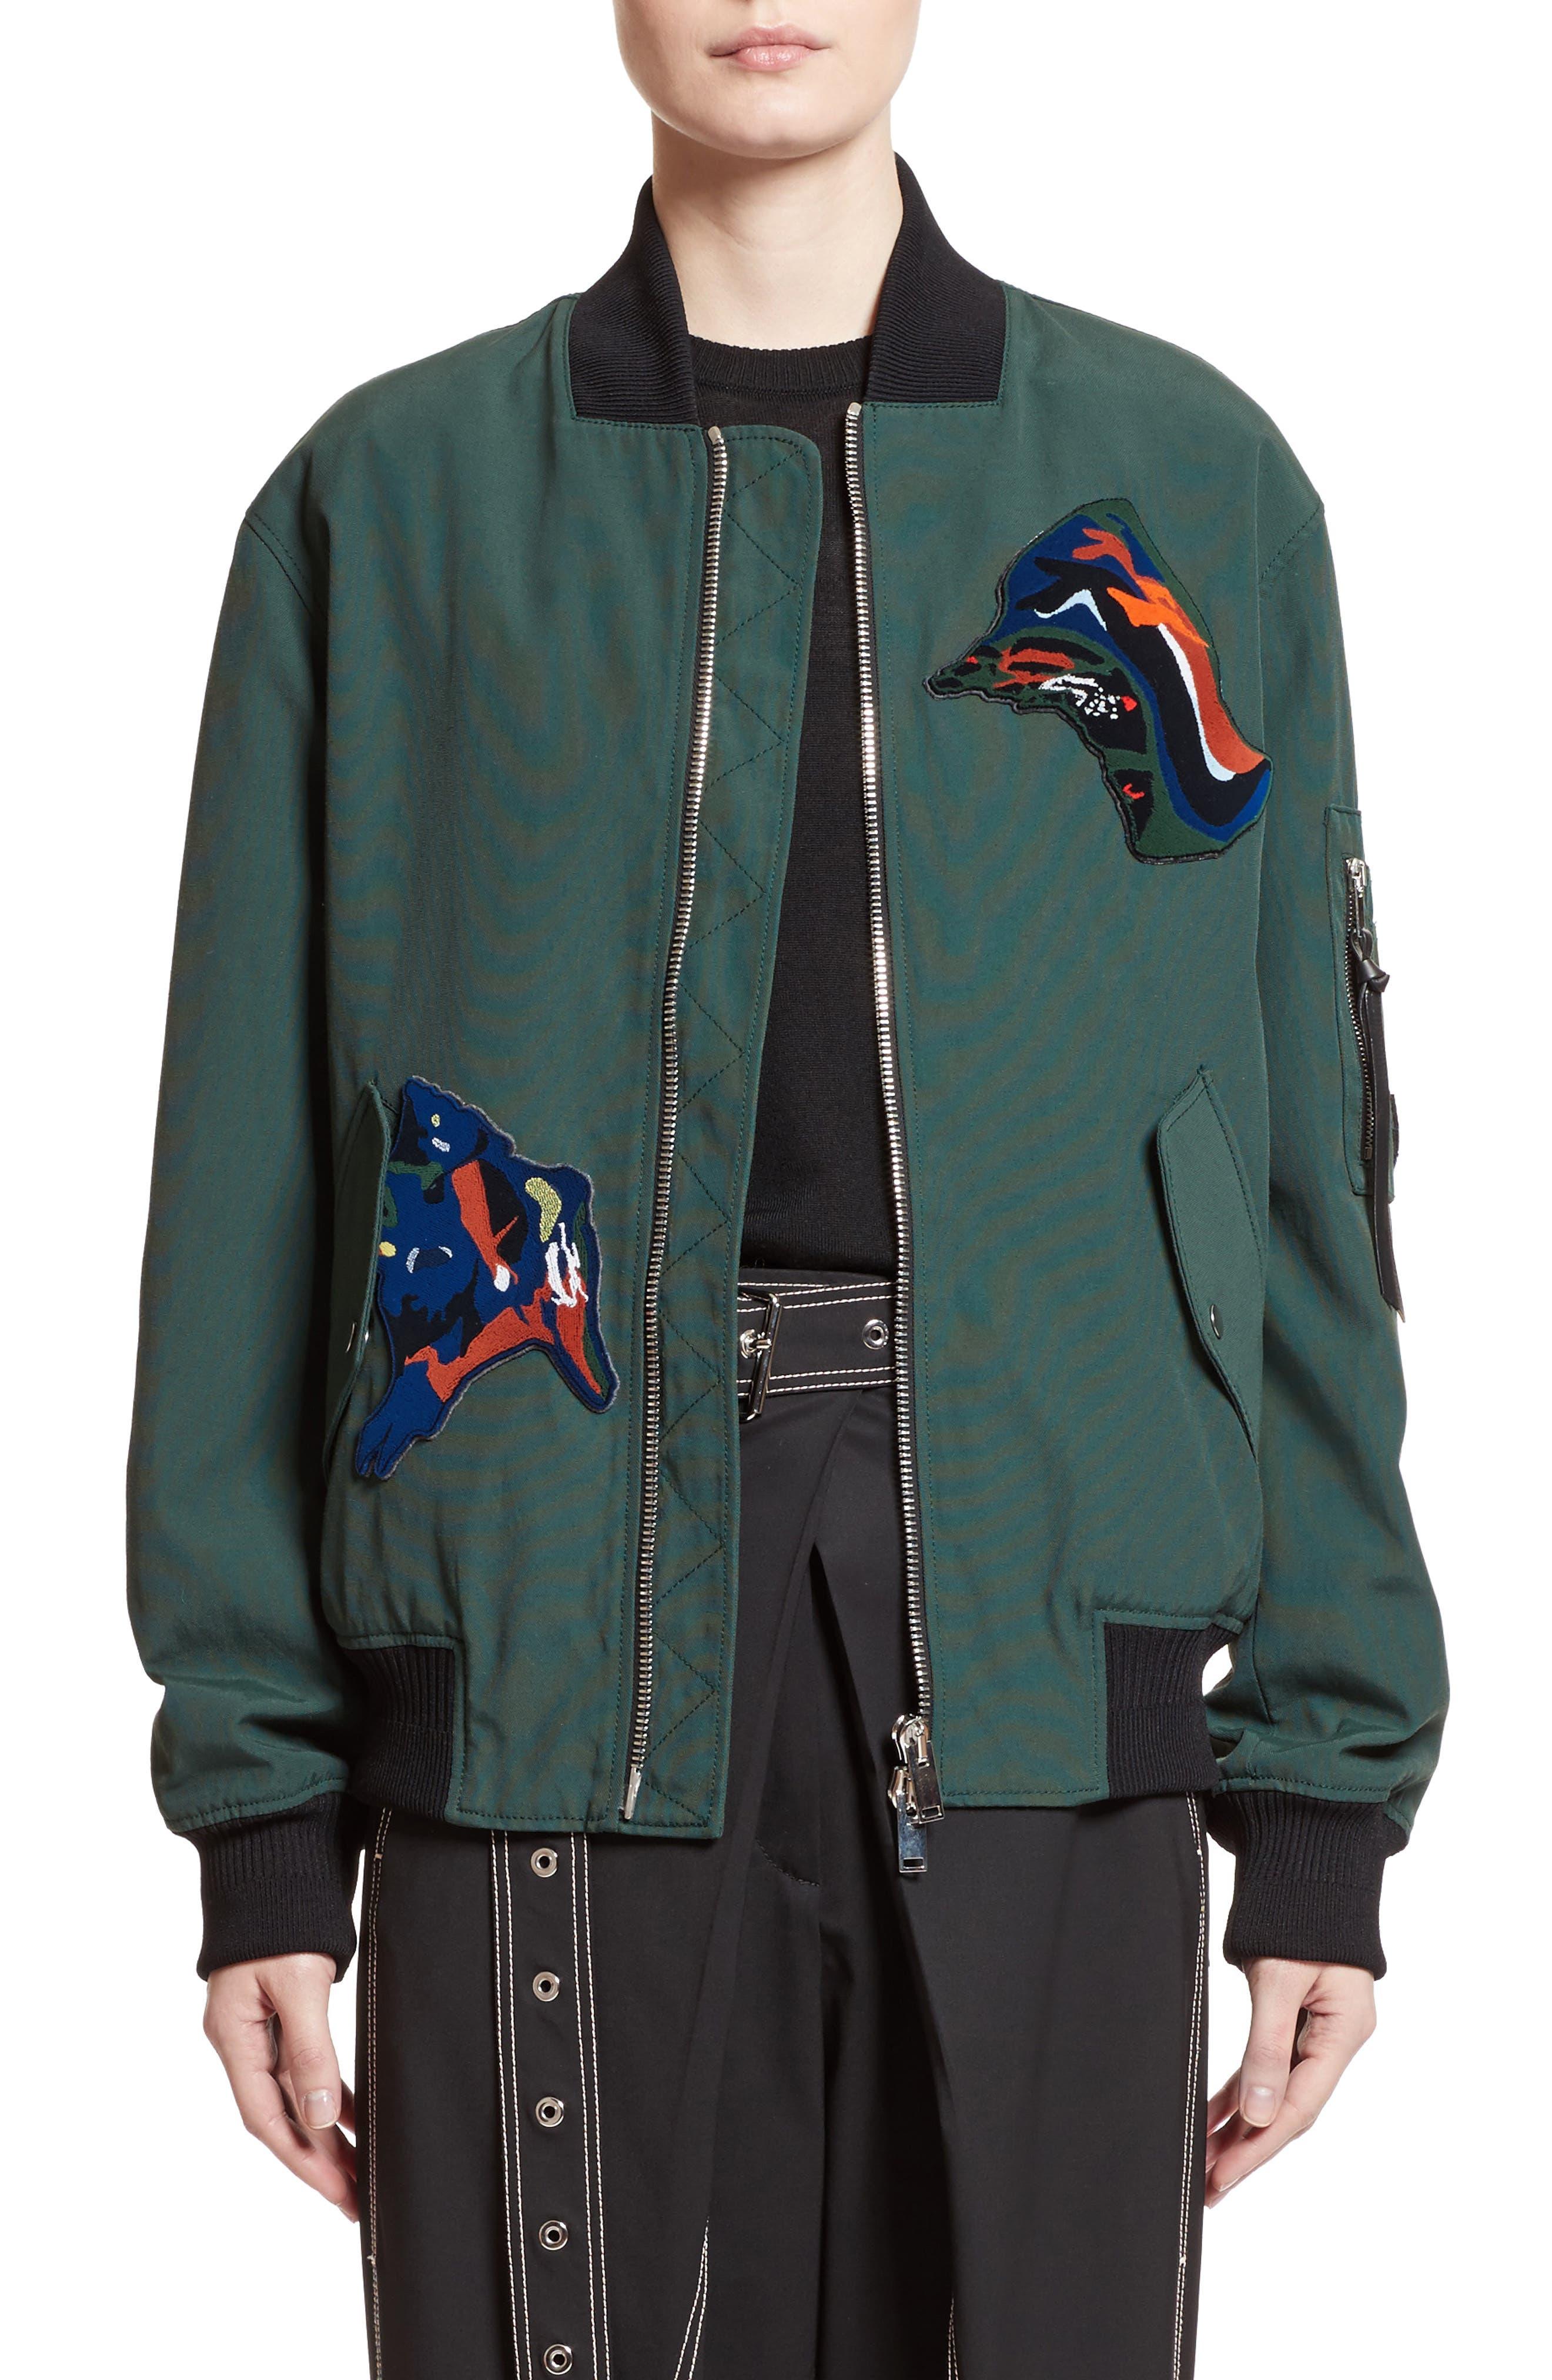 Main Image - Proenza Schouler Patch Embellished Bomber Jacket